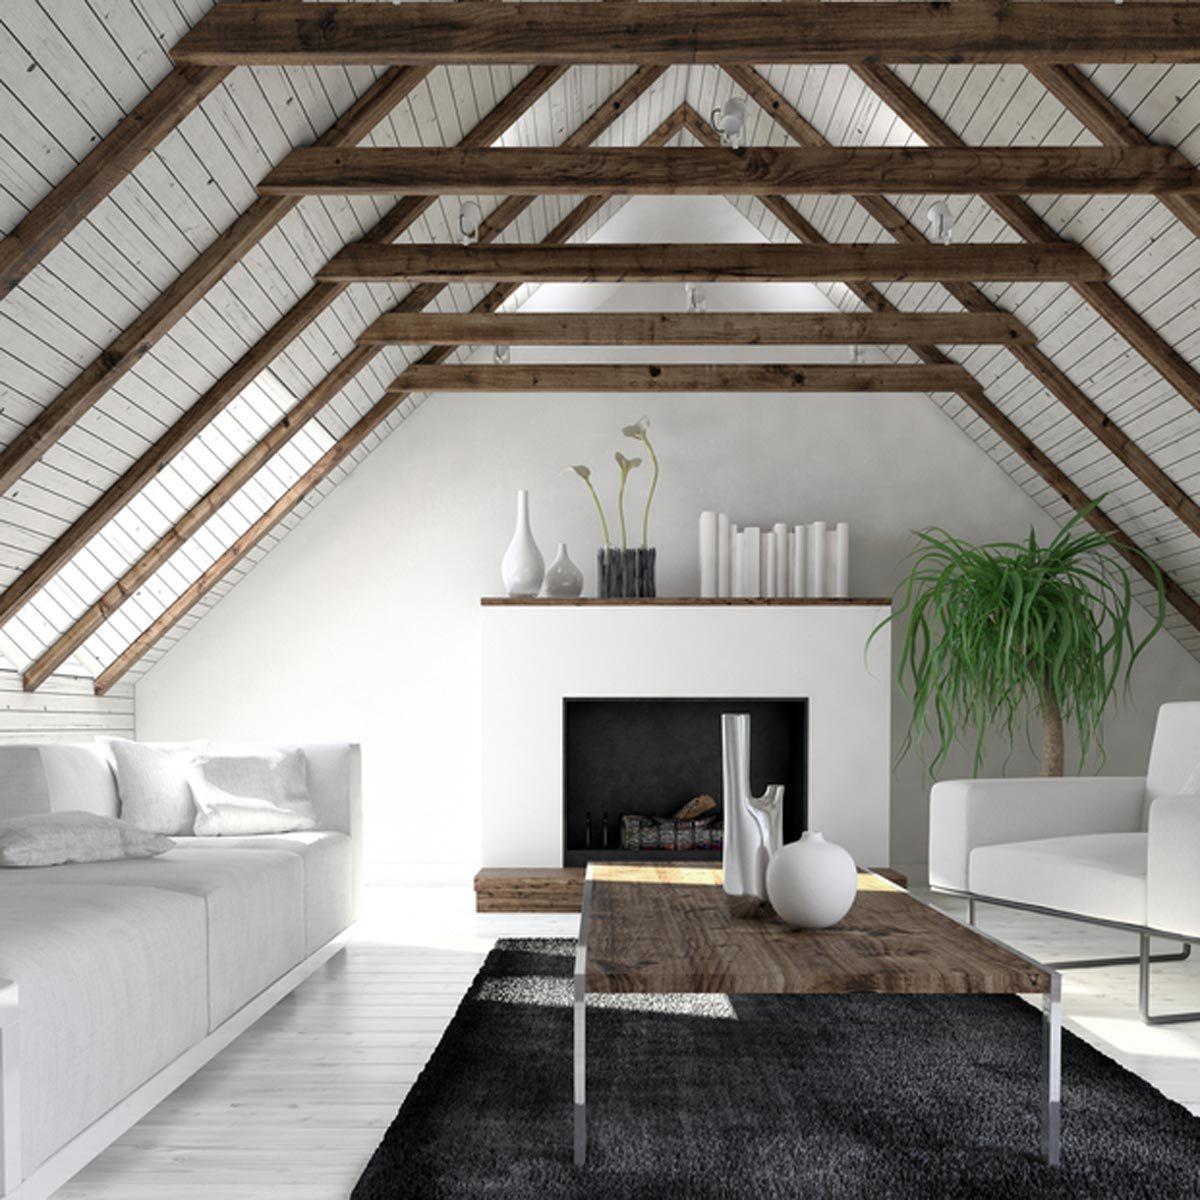 shutterstock_658288036-attic-1200x1200 attic space living room exposed beams